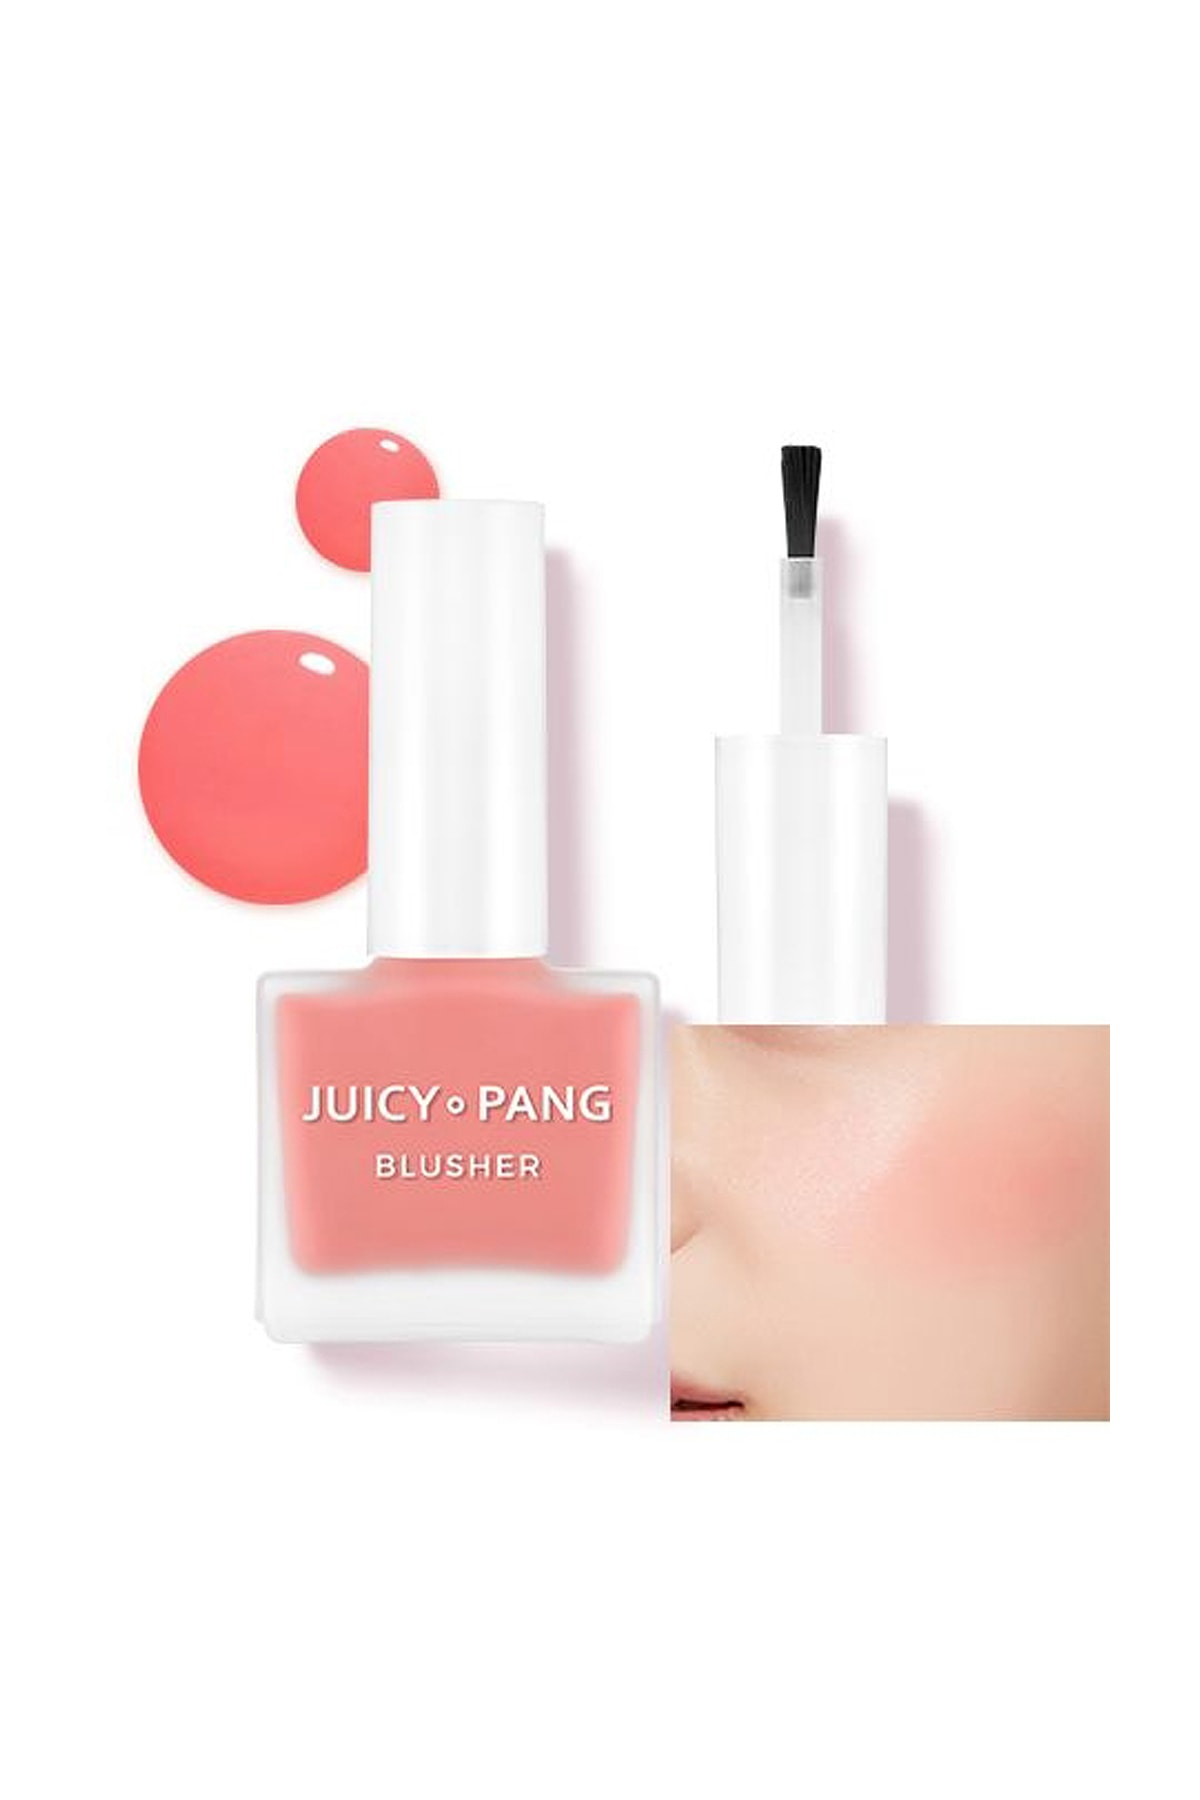 Missha Doğal Görünüm Sunan Nemlendirici Likit Allık 9g. APIEU Juicy-Pang Water Blusher (PK04) 0